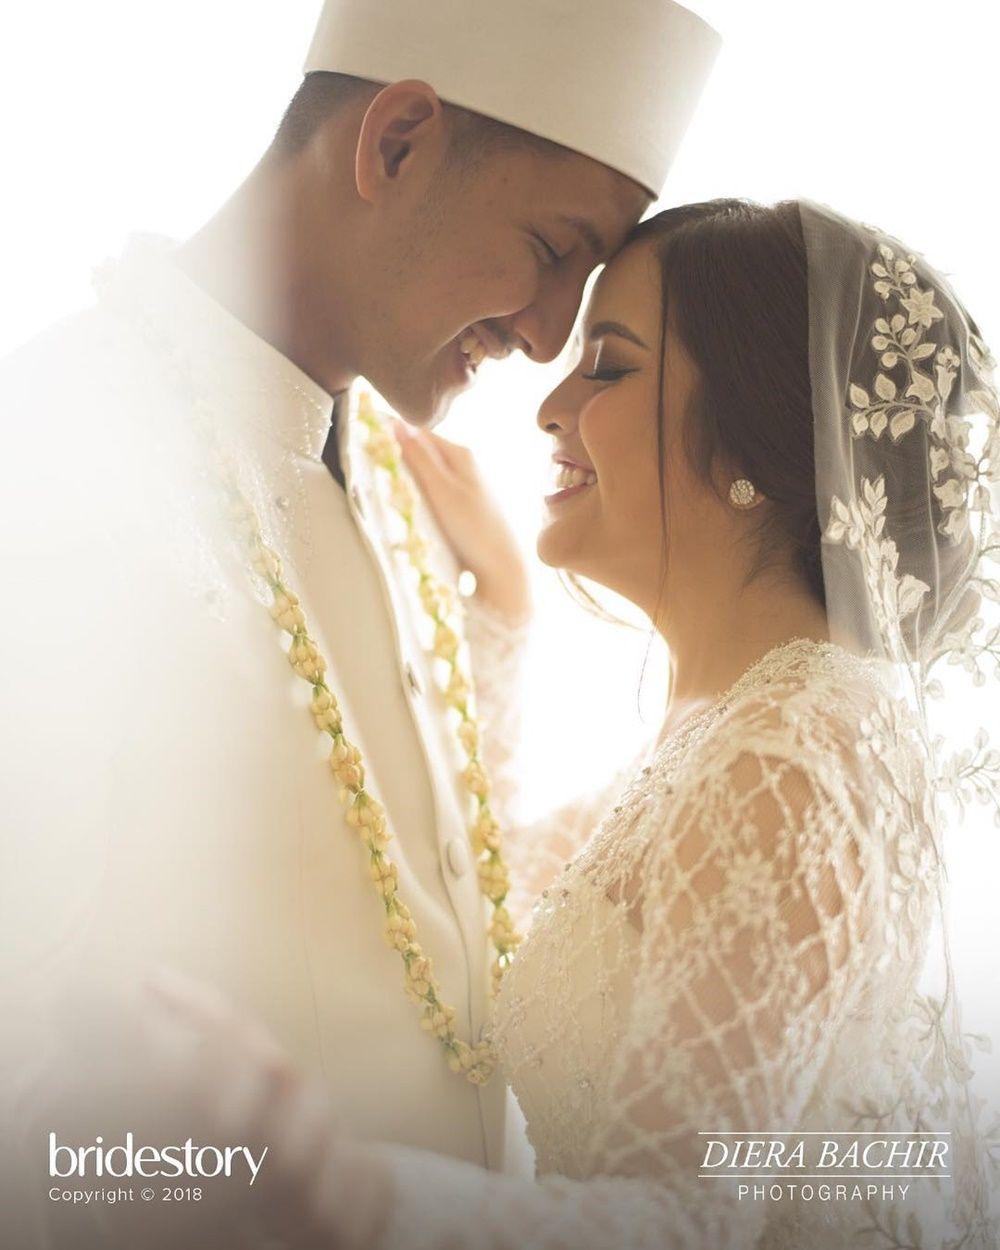 Hampir 6 Tahun Pacaran, Tasya Kamila dan Randi Bachtiar Resmi Menikah